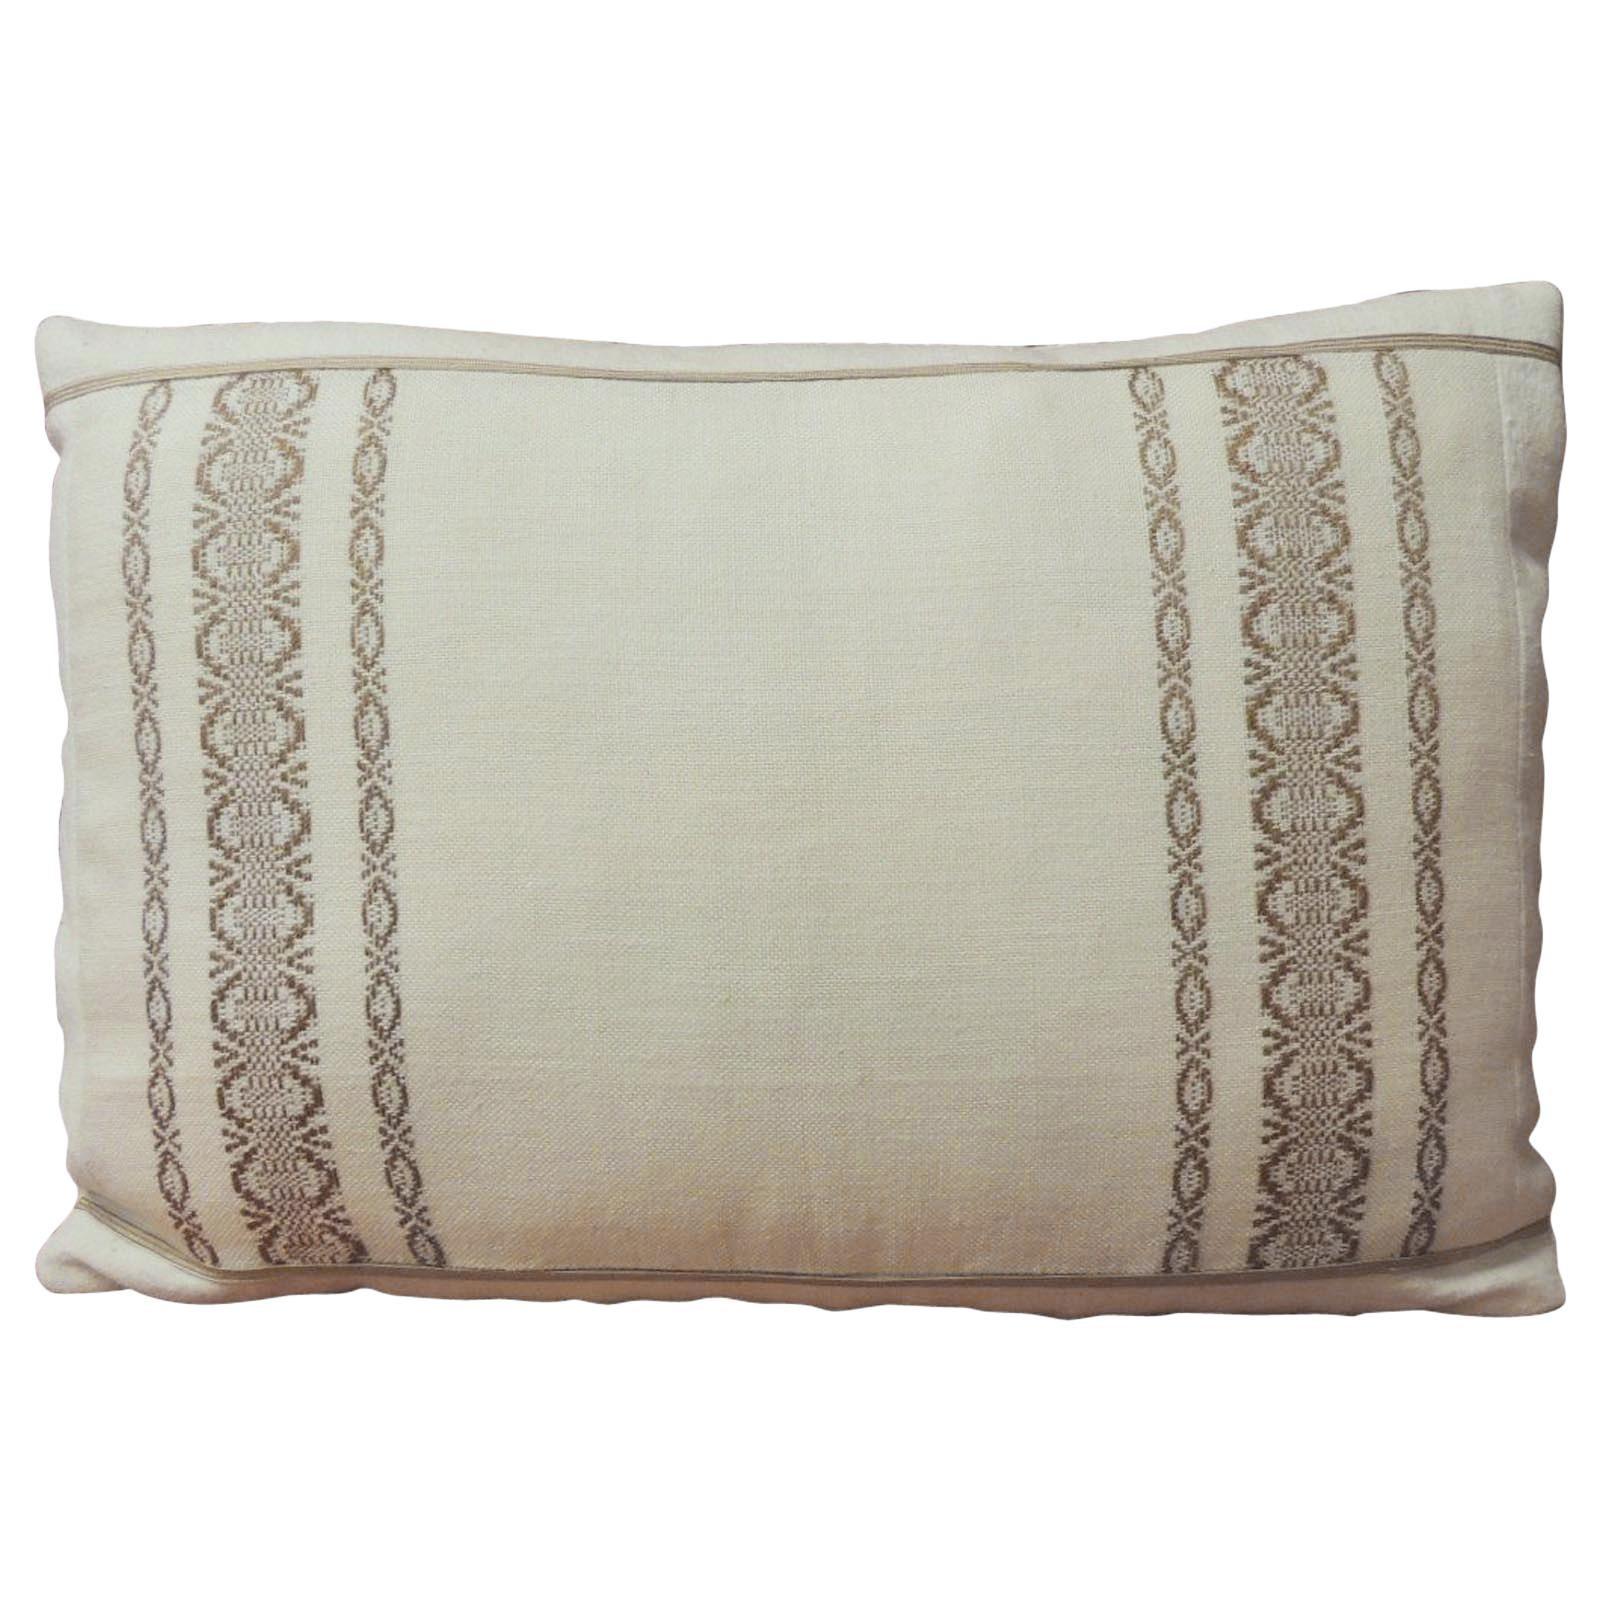 19th Century Style Petite Greek Isle Embroidery Decorative Lumbar Pillow